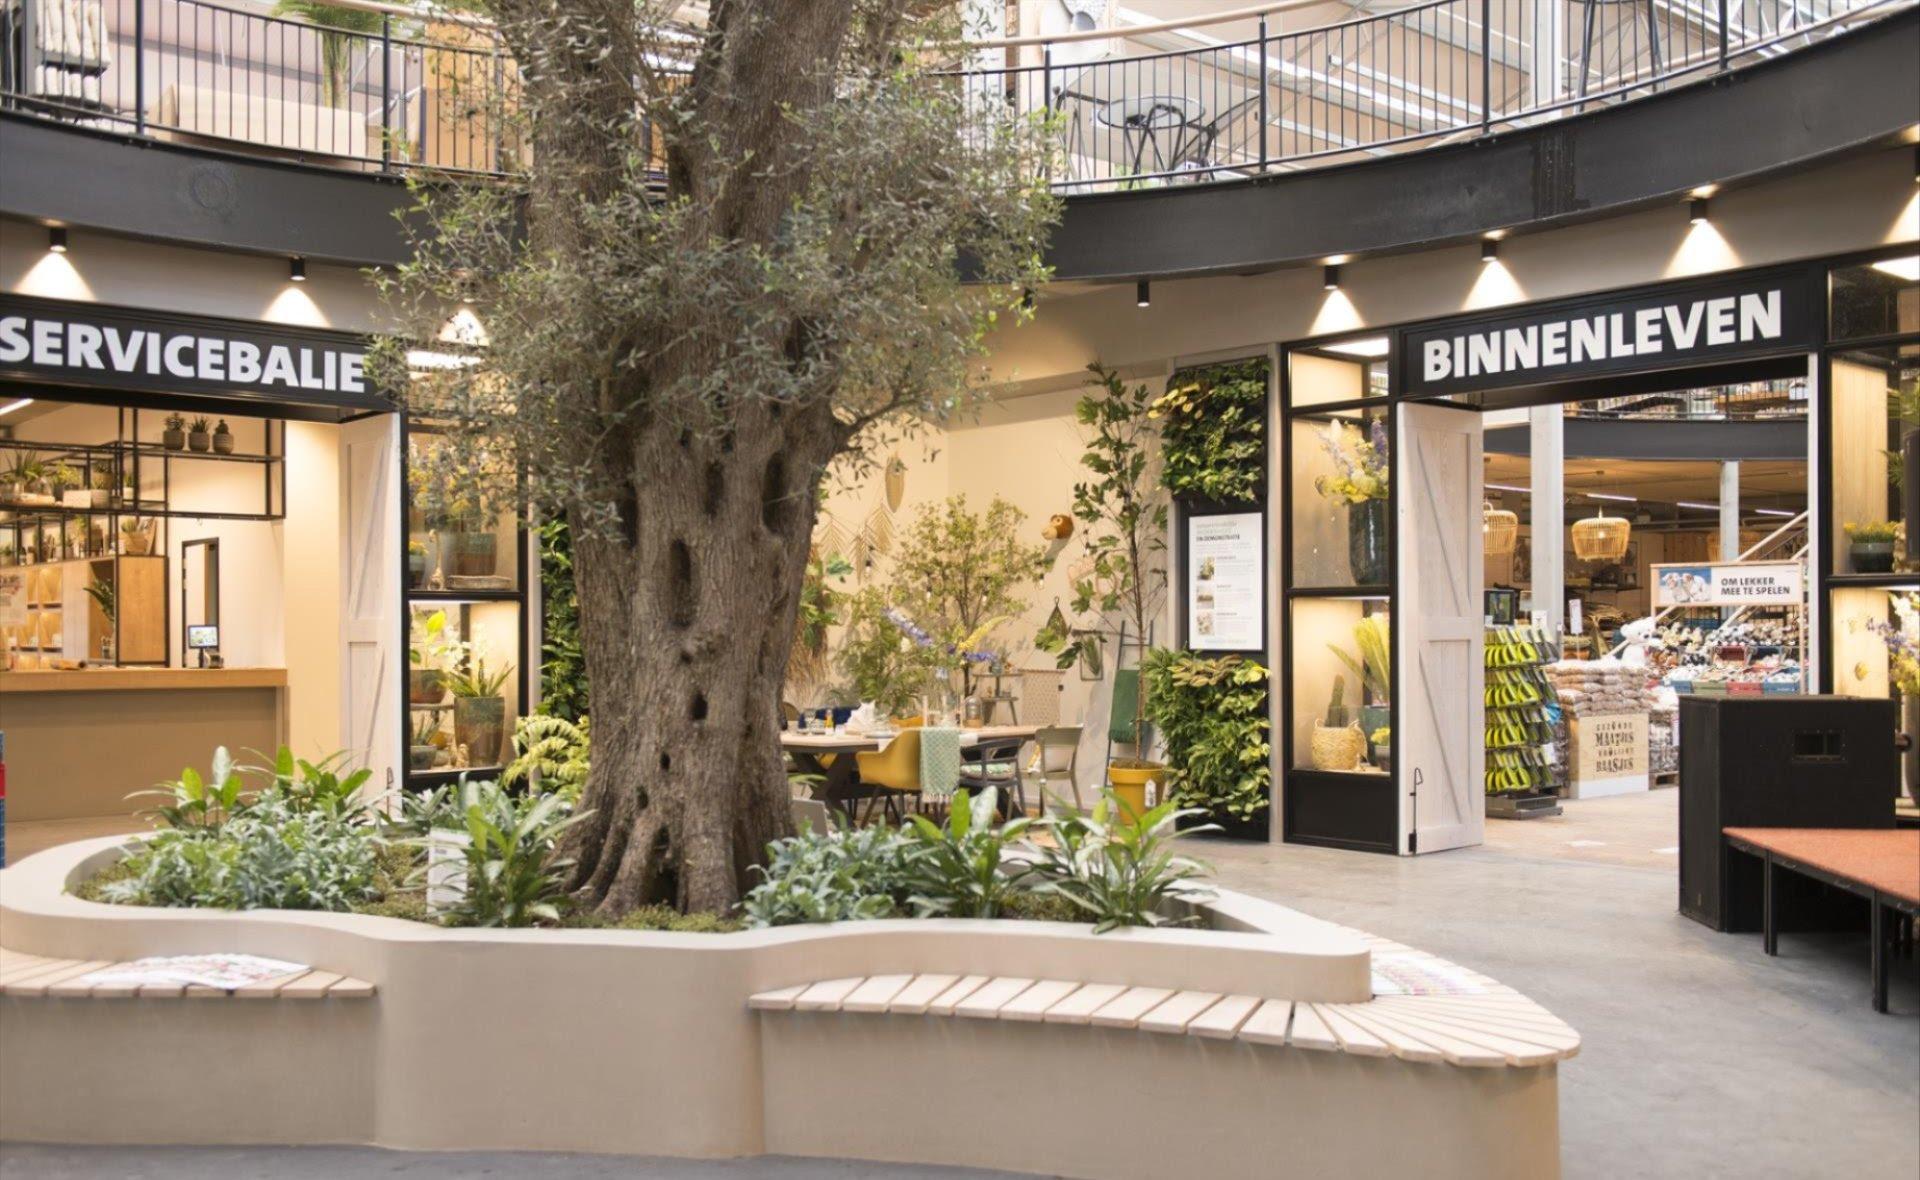 TUINBULLETIN:  Strokenteelt, Wilde Weelde & De levende tuin, Rozen snoeien en flagshipstore Intratuin